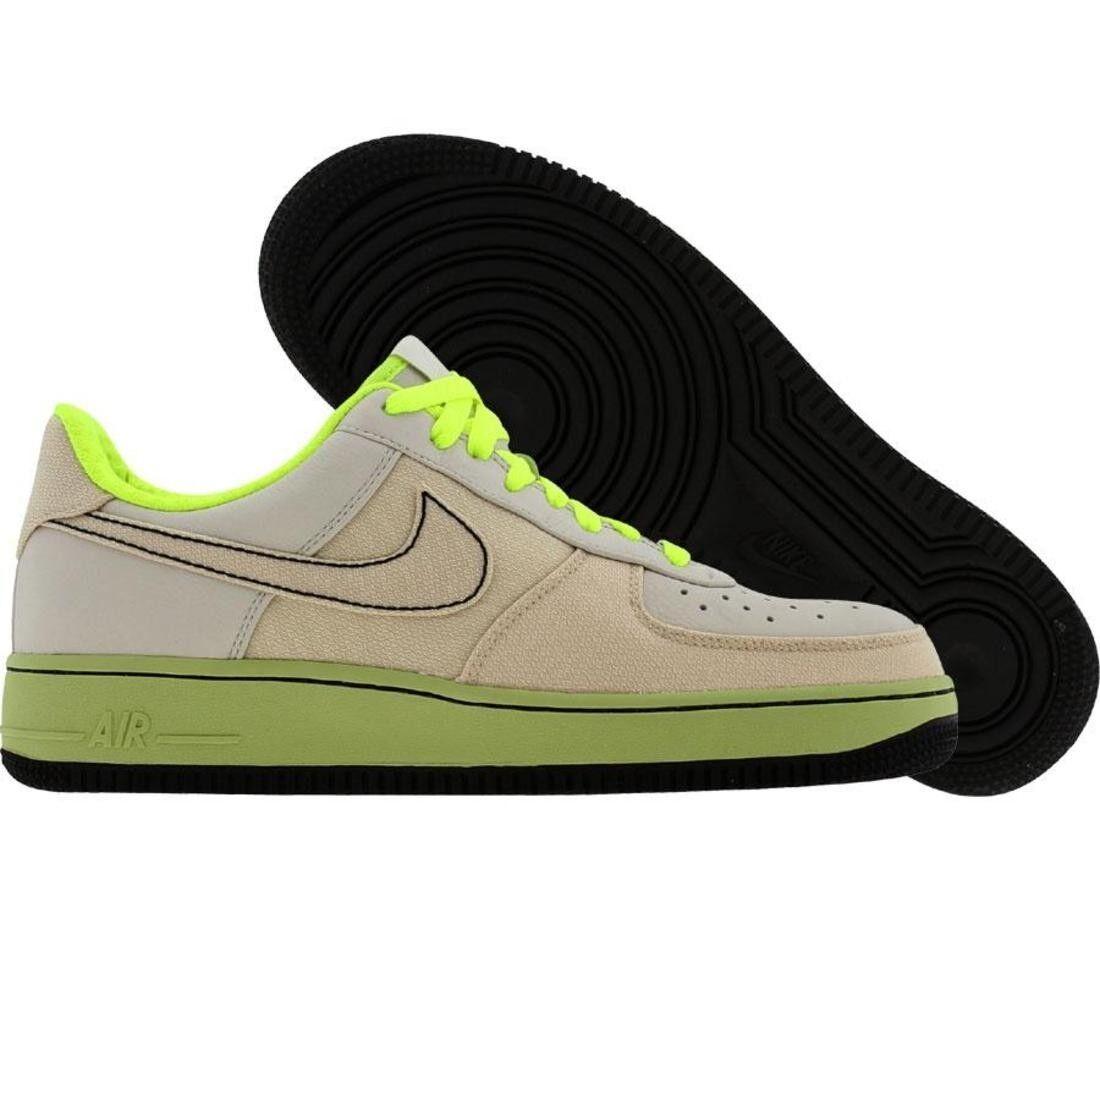 315180-002 Nike Air Force 1 07 Low Premium Bone Voltage